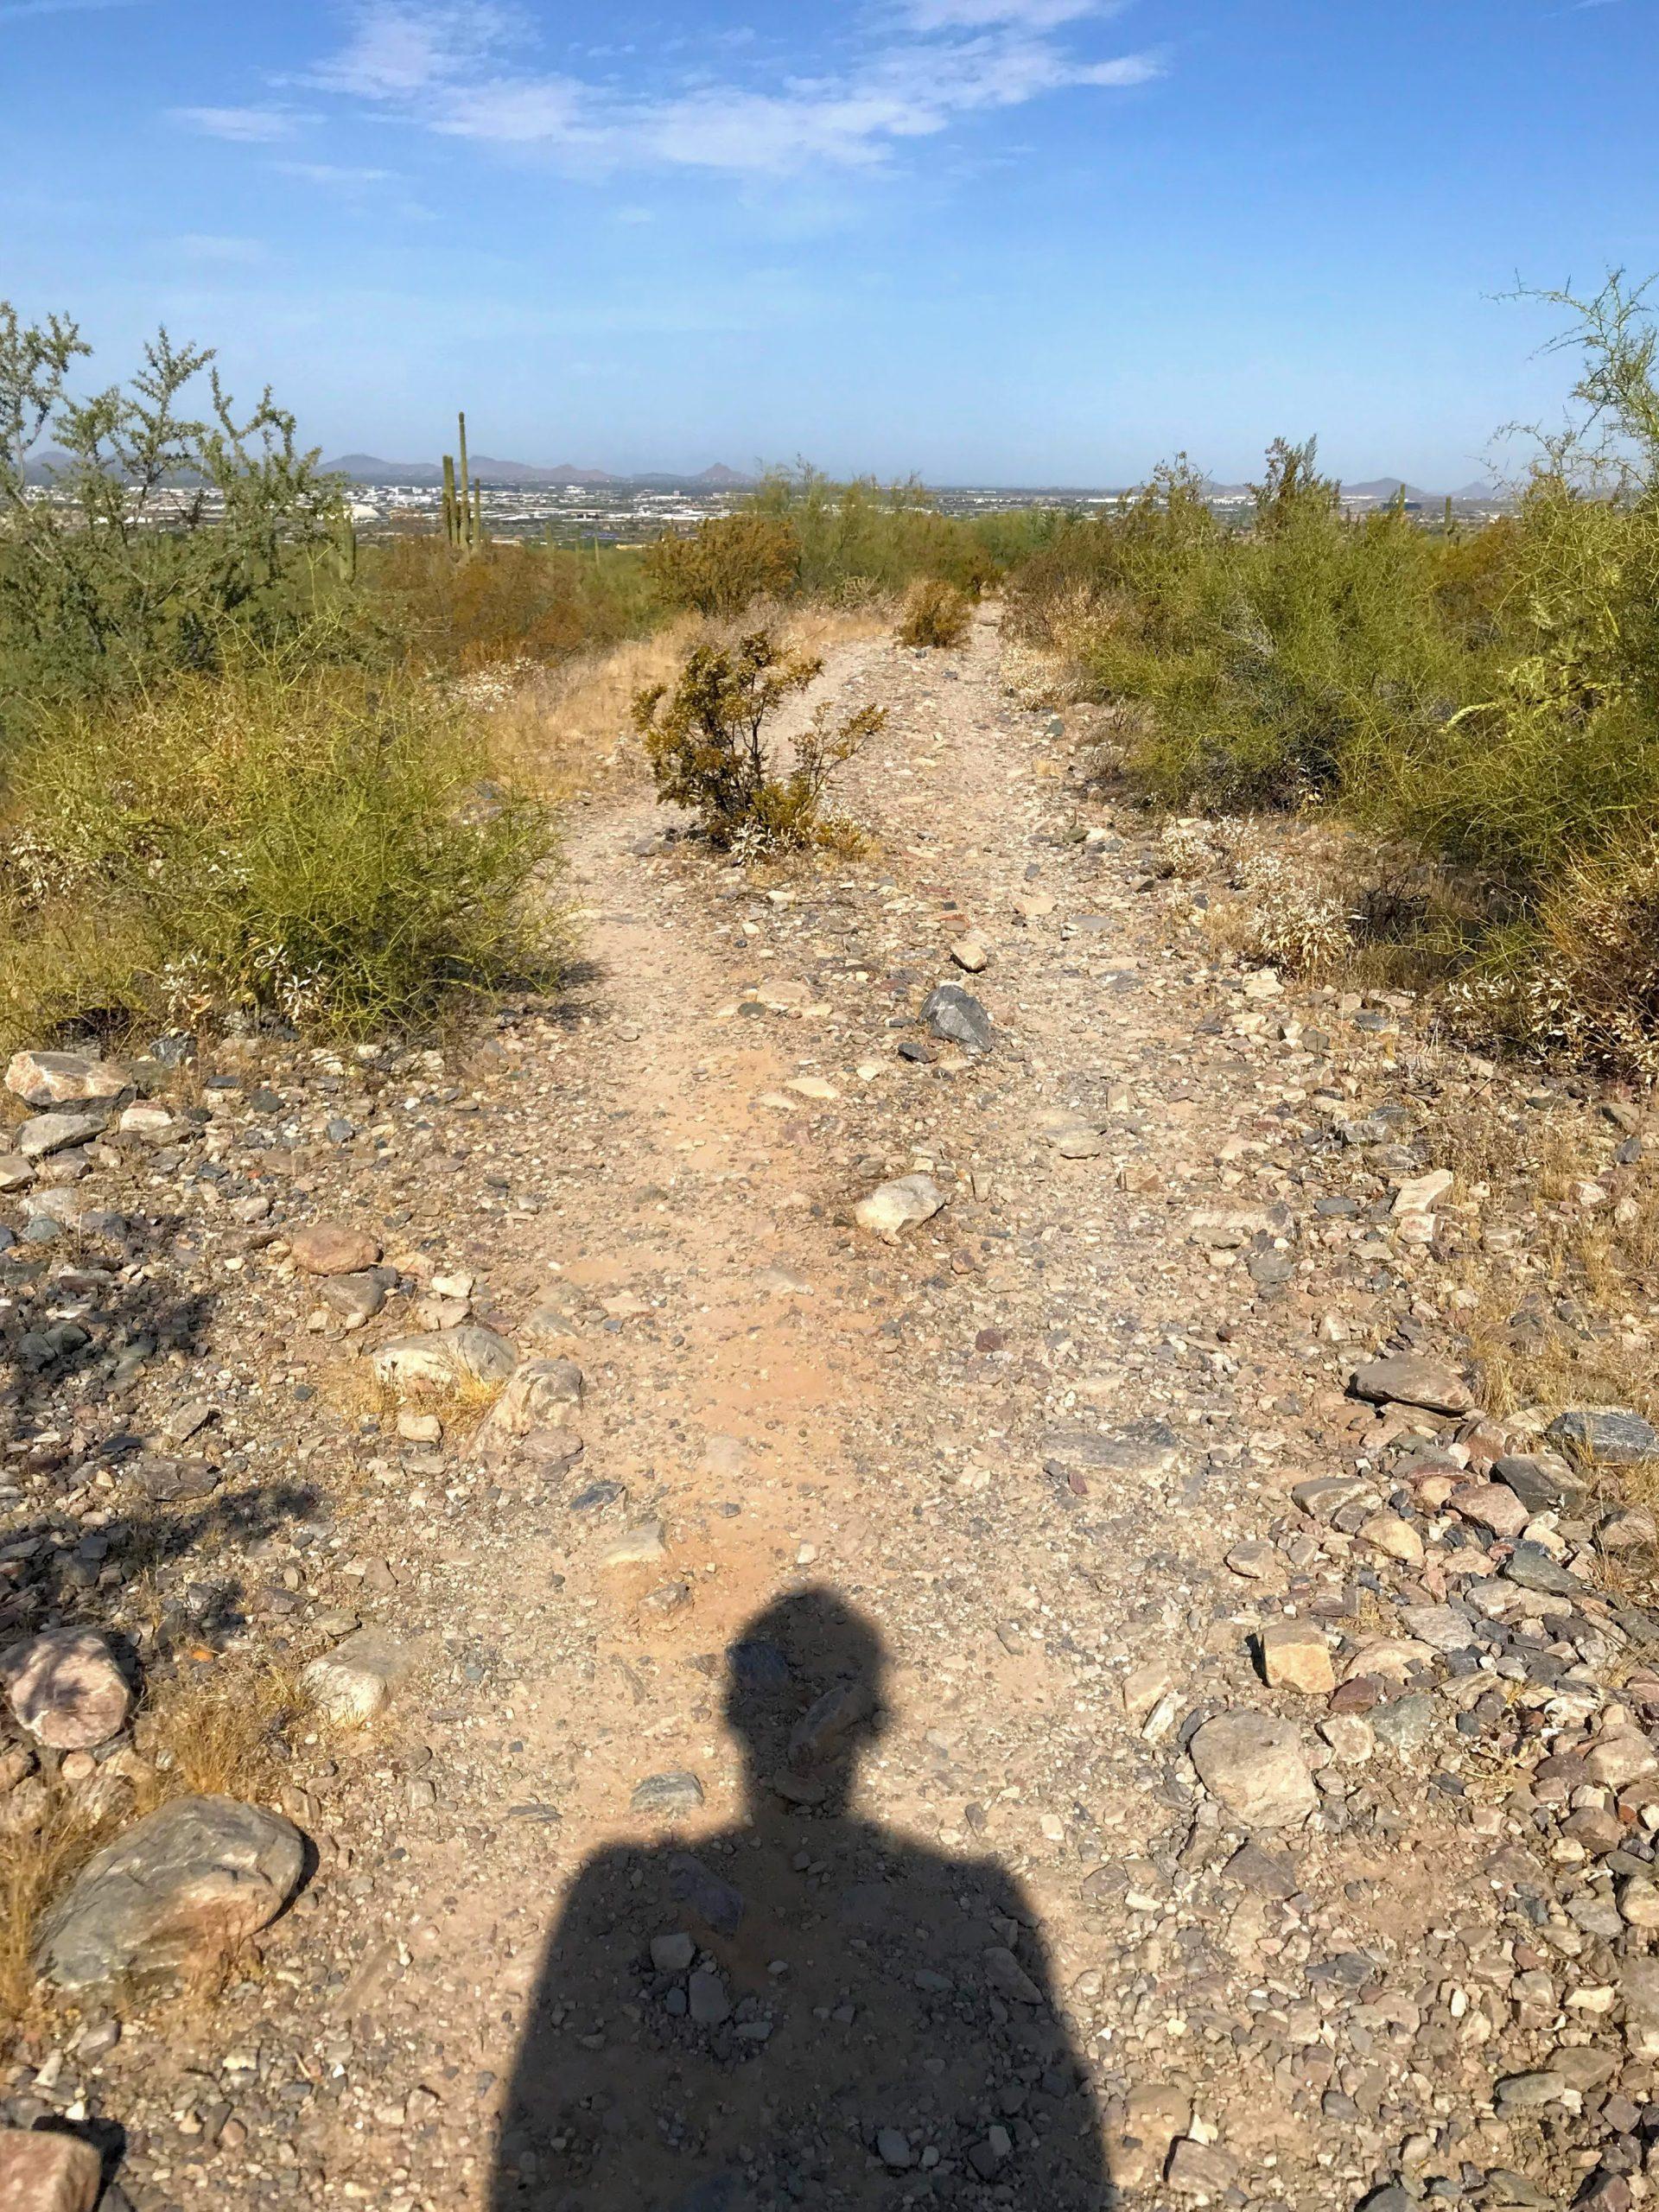 Levee Trail Hike Mcdowell Sonoran Preserve Levee Trail